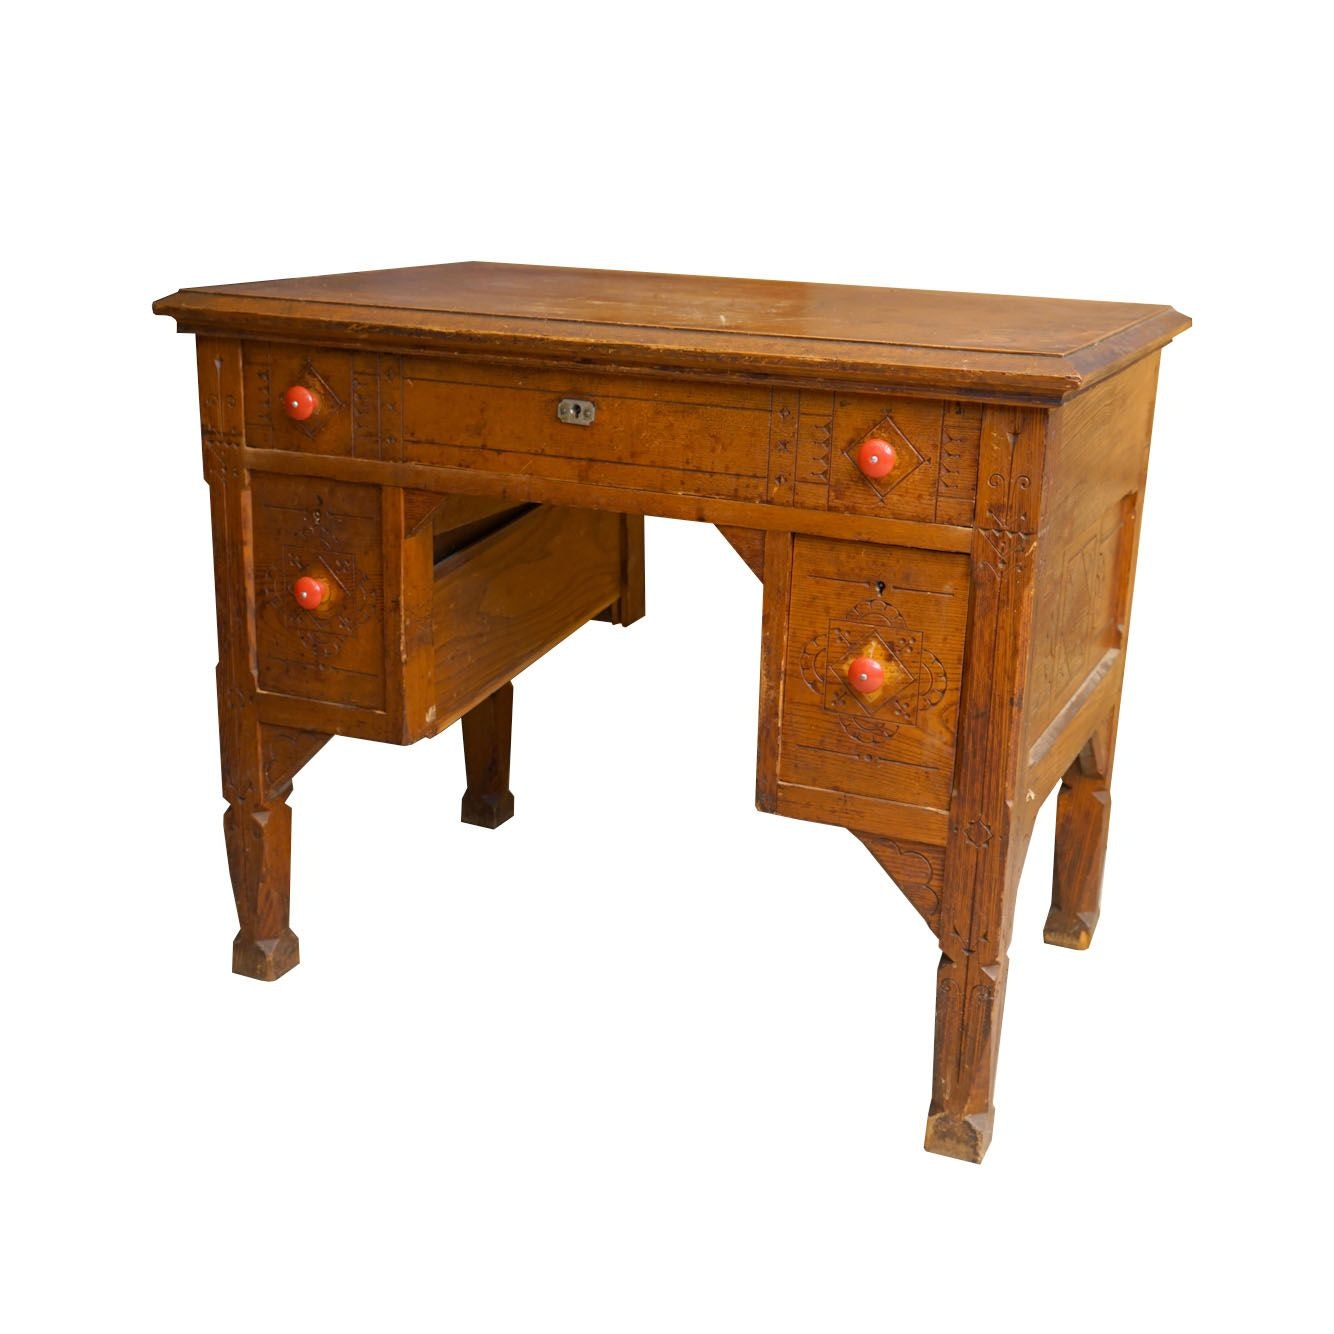 Victorian Pine Desk, Late 19th Century